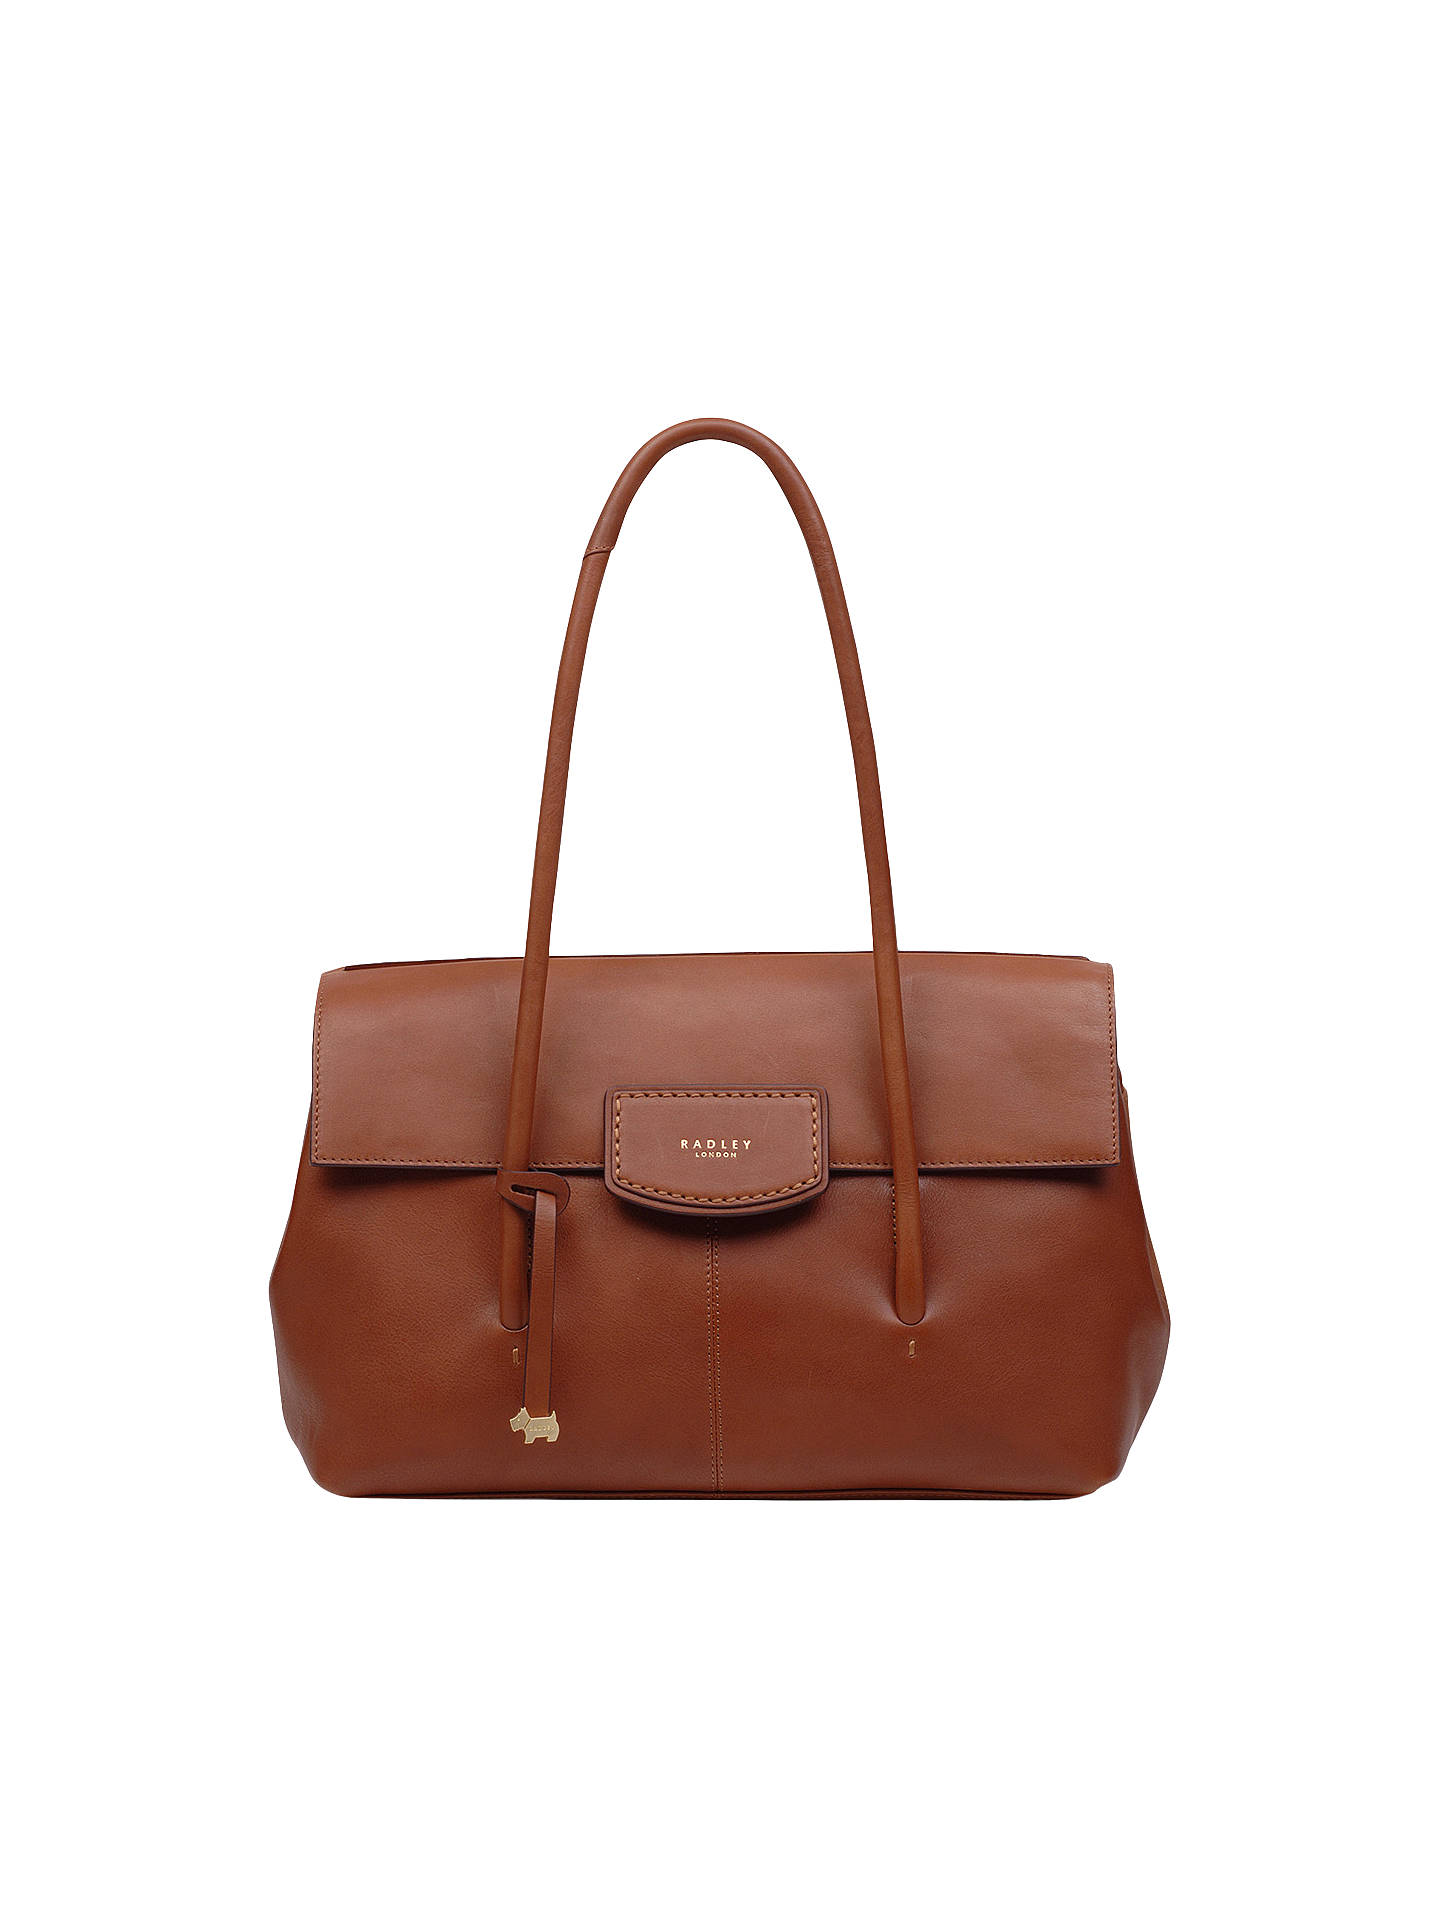 d841f8e991ee Radley Burnham Beeches Leather Large Flapover Shoulder Bag, Tan